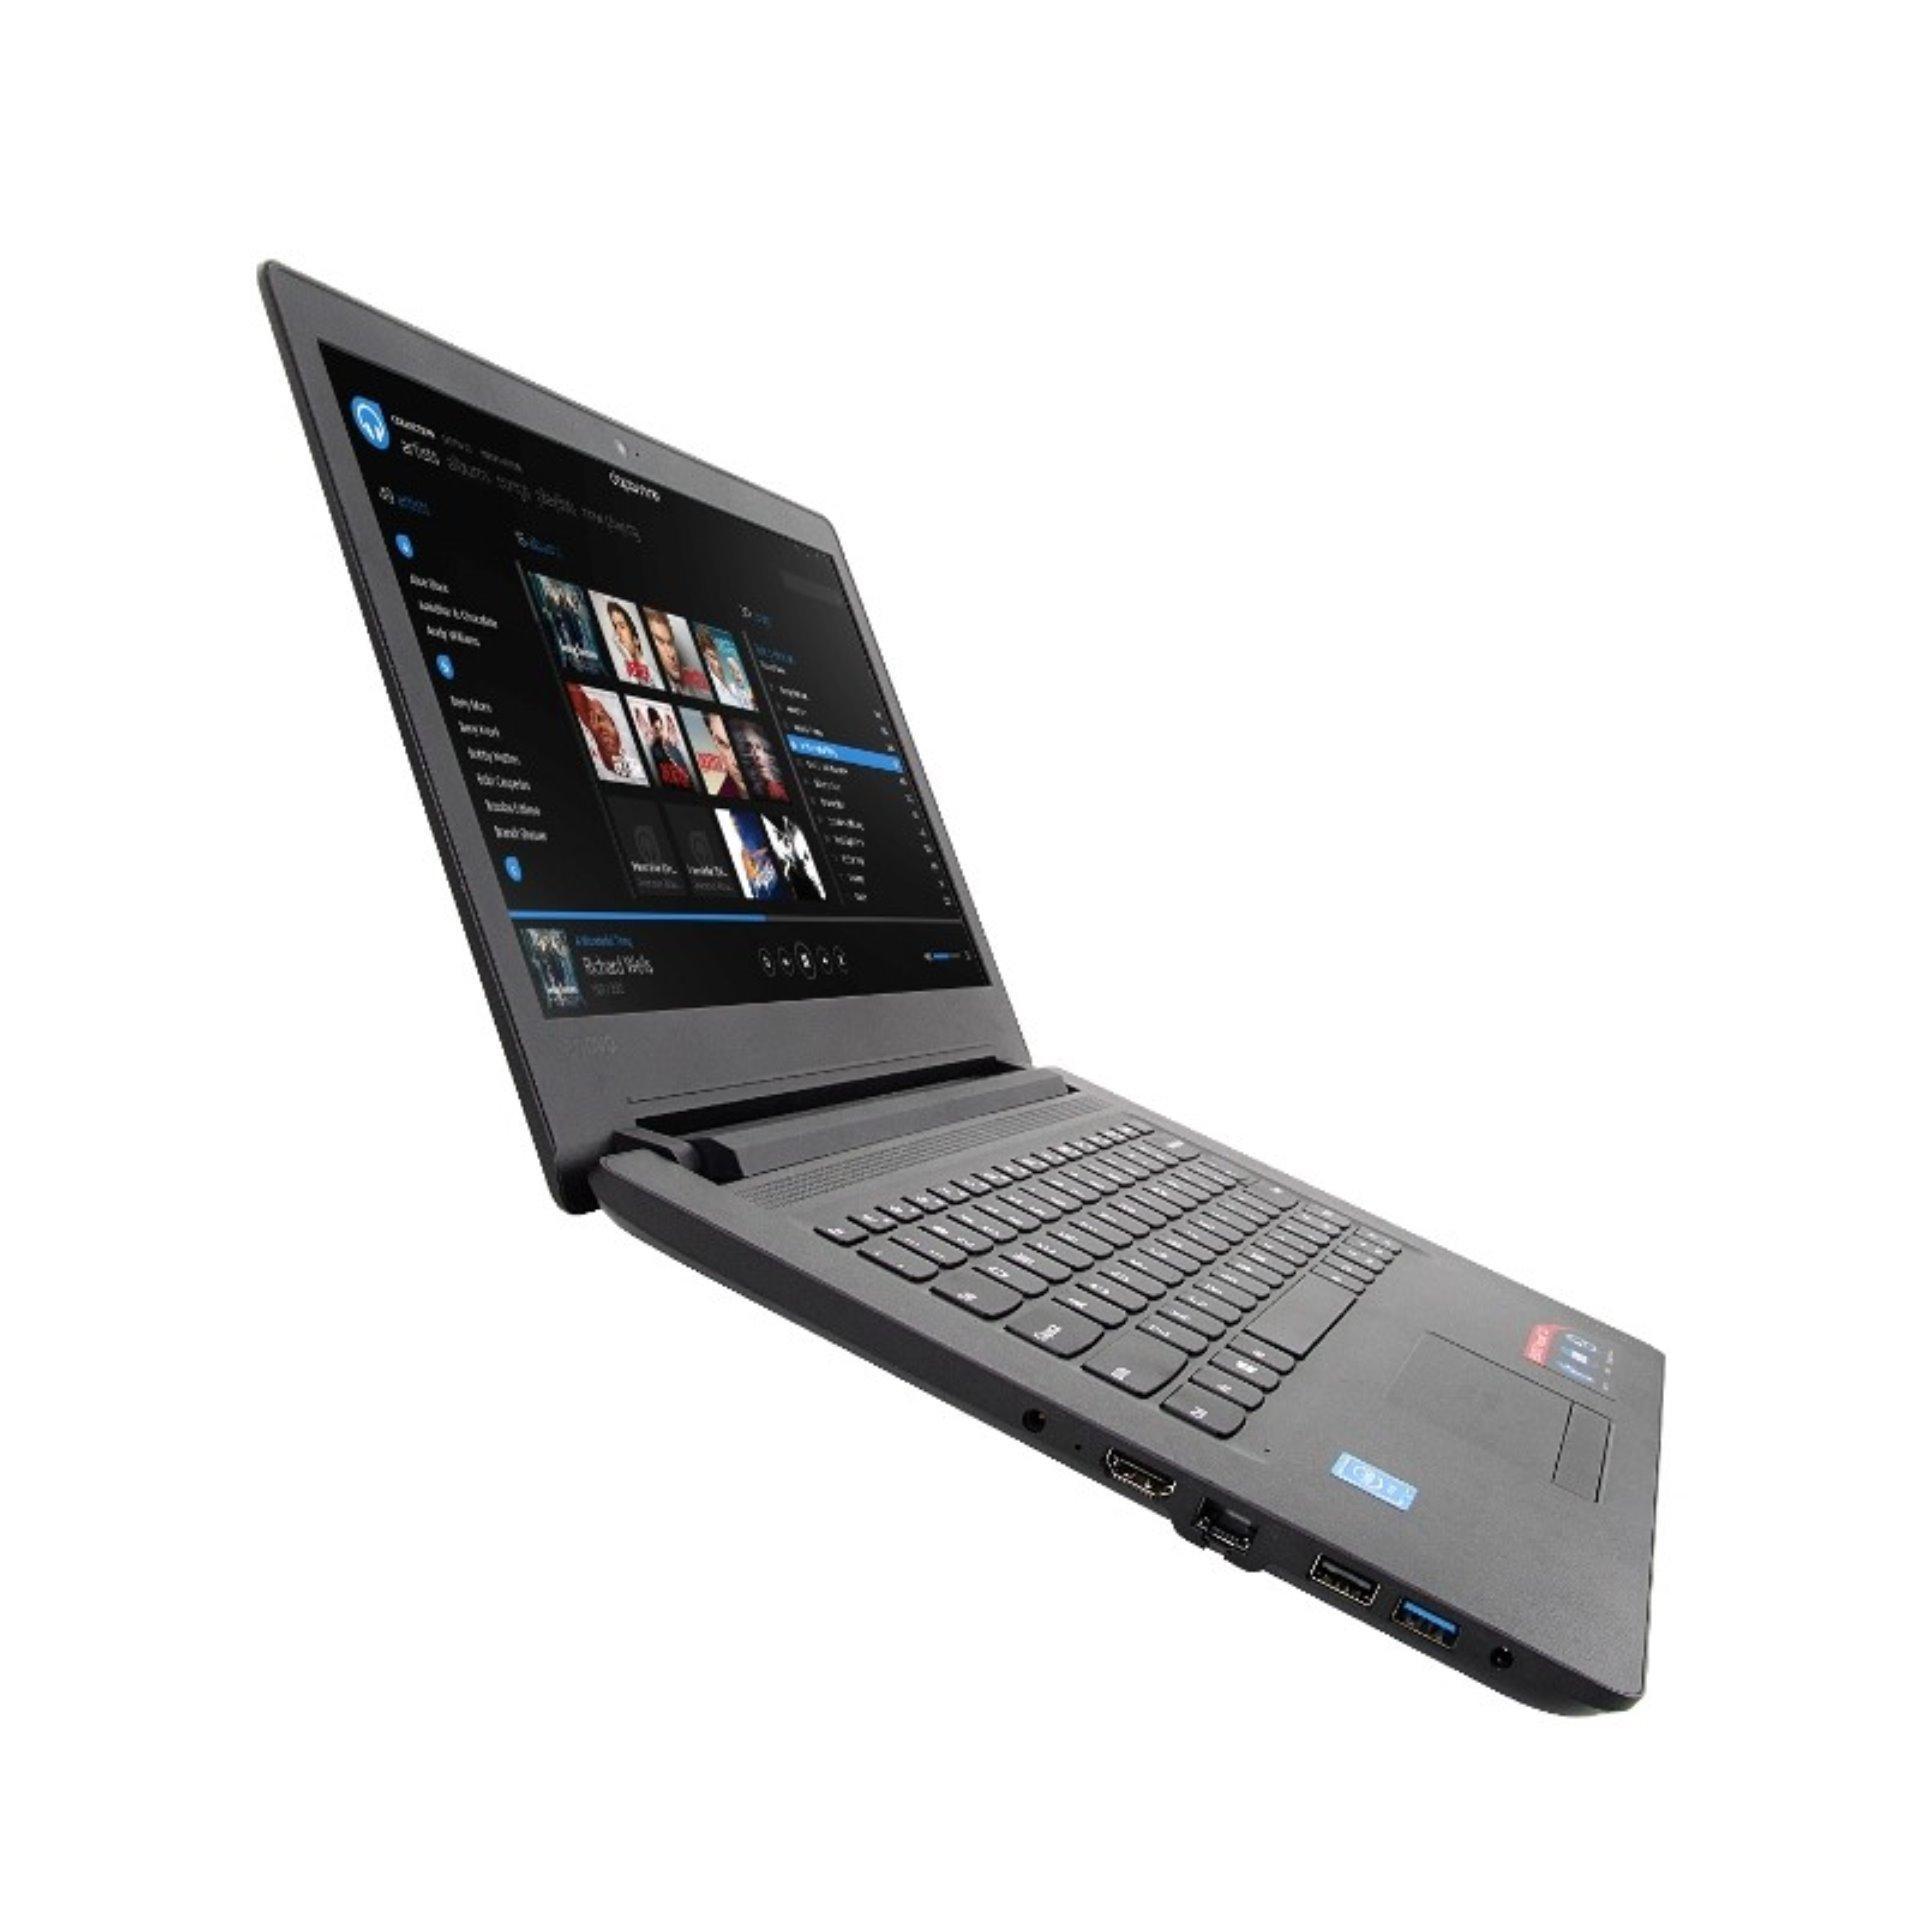 Inch Asus Rog Gl 552 X Dm409t Core I7 7700 4096mb 1tb N Vidia Gtx950 Harddisk 1 Tb Laptop Resmi Lenovo Ip 110 14ibr 8gid Cel N3060 Ram4gb Hdd1tb Dvdrw Dos Layar